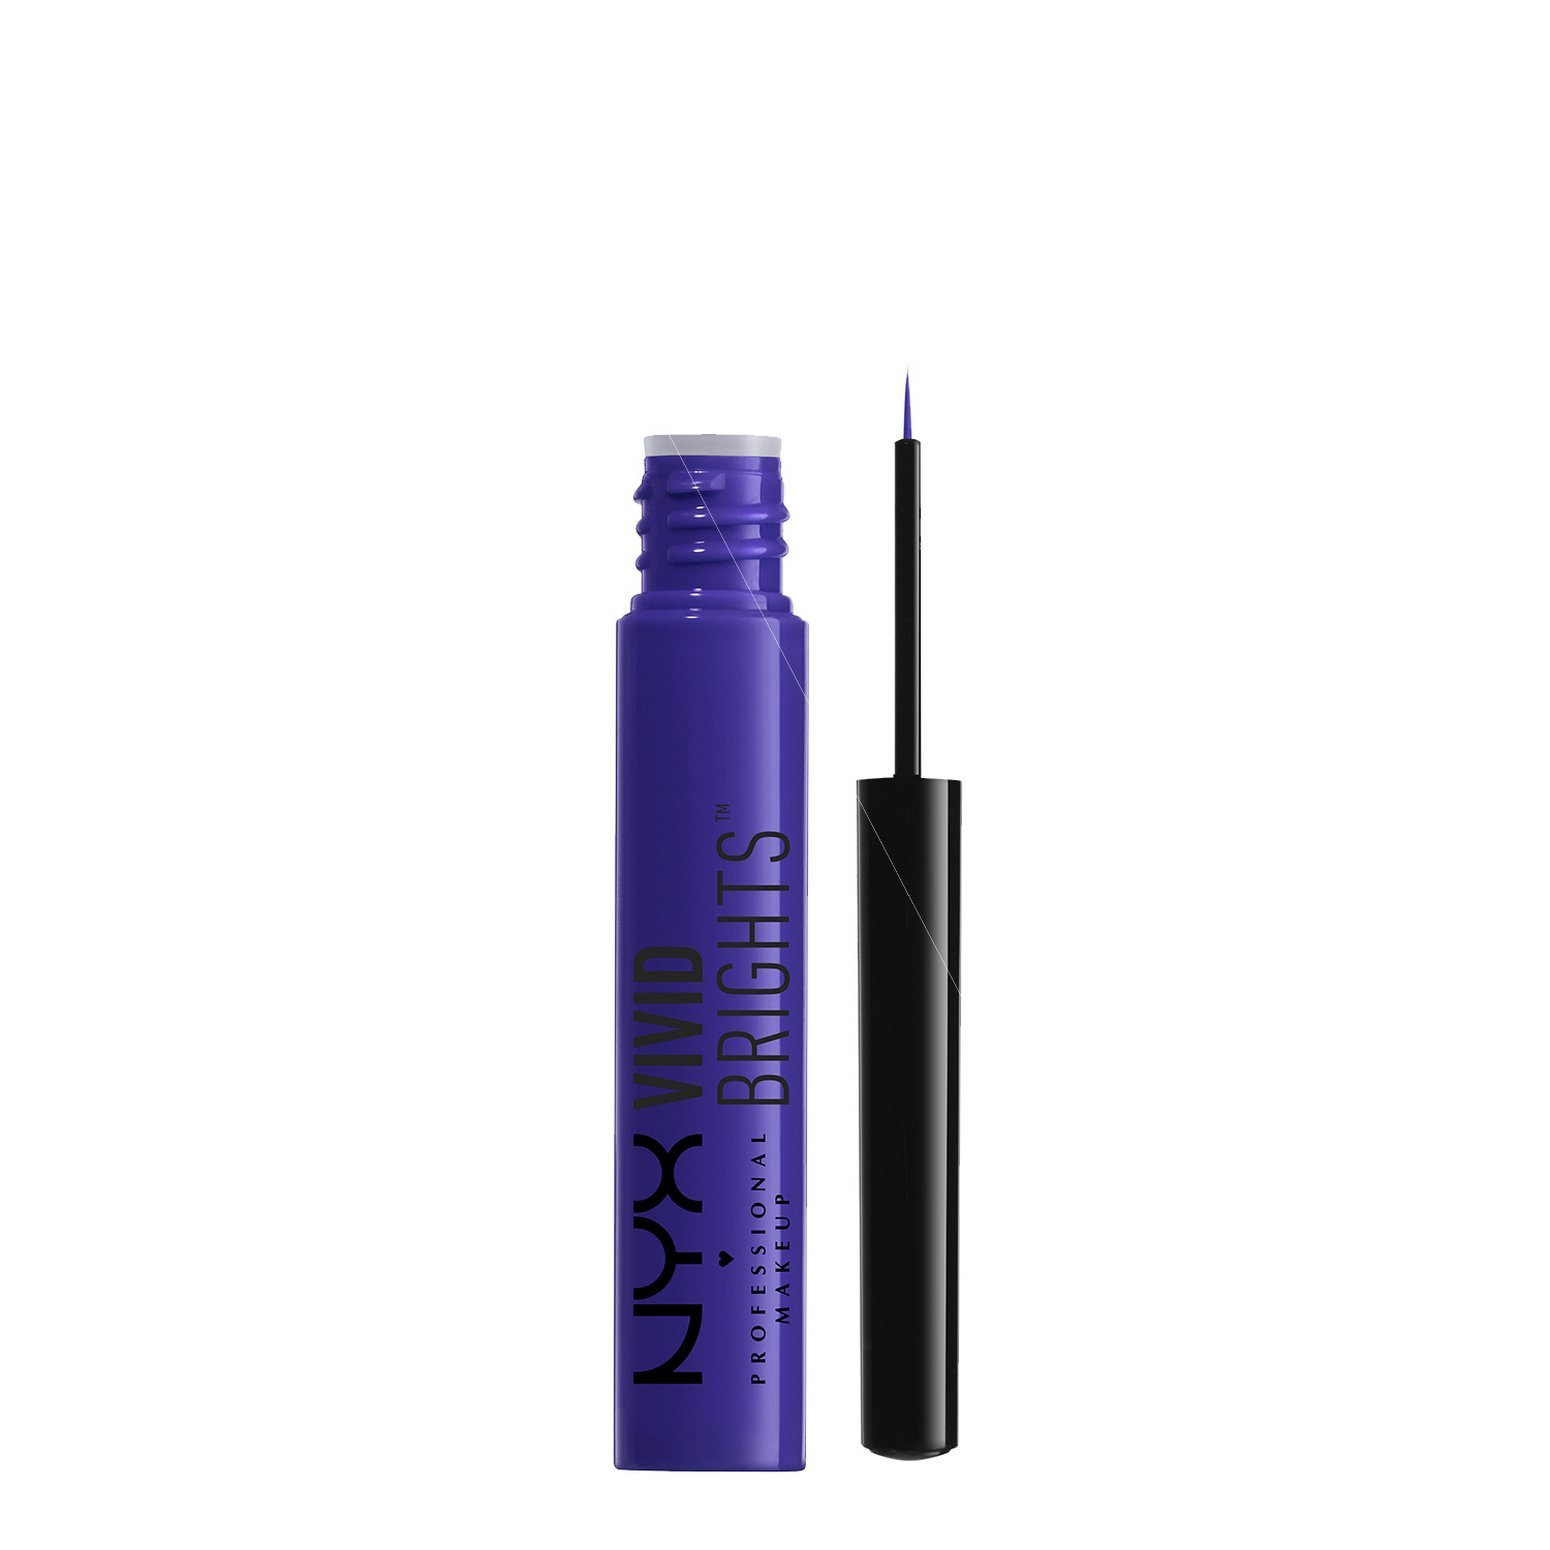 NYX PROFESSIONAL MAKEUP Vivid Brights Liner, Violet, 0.068 Fluid Ounce